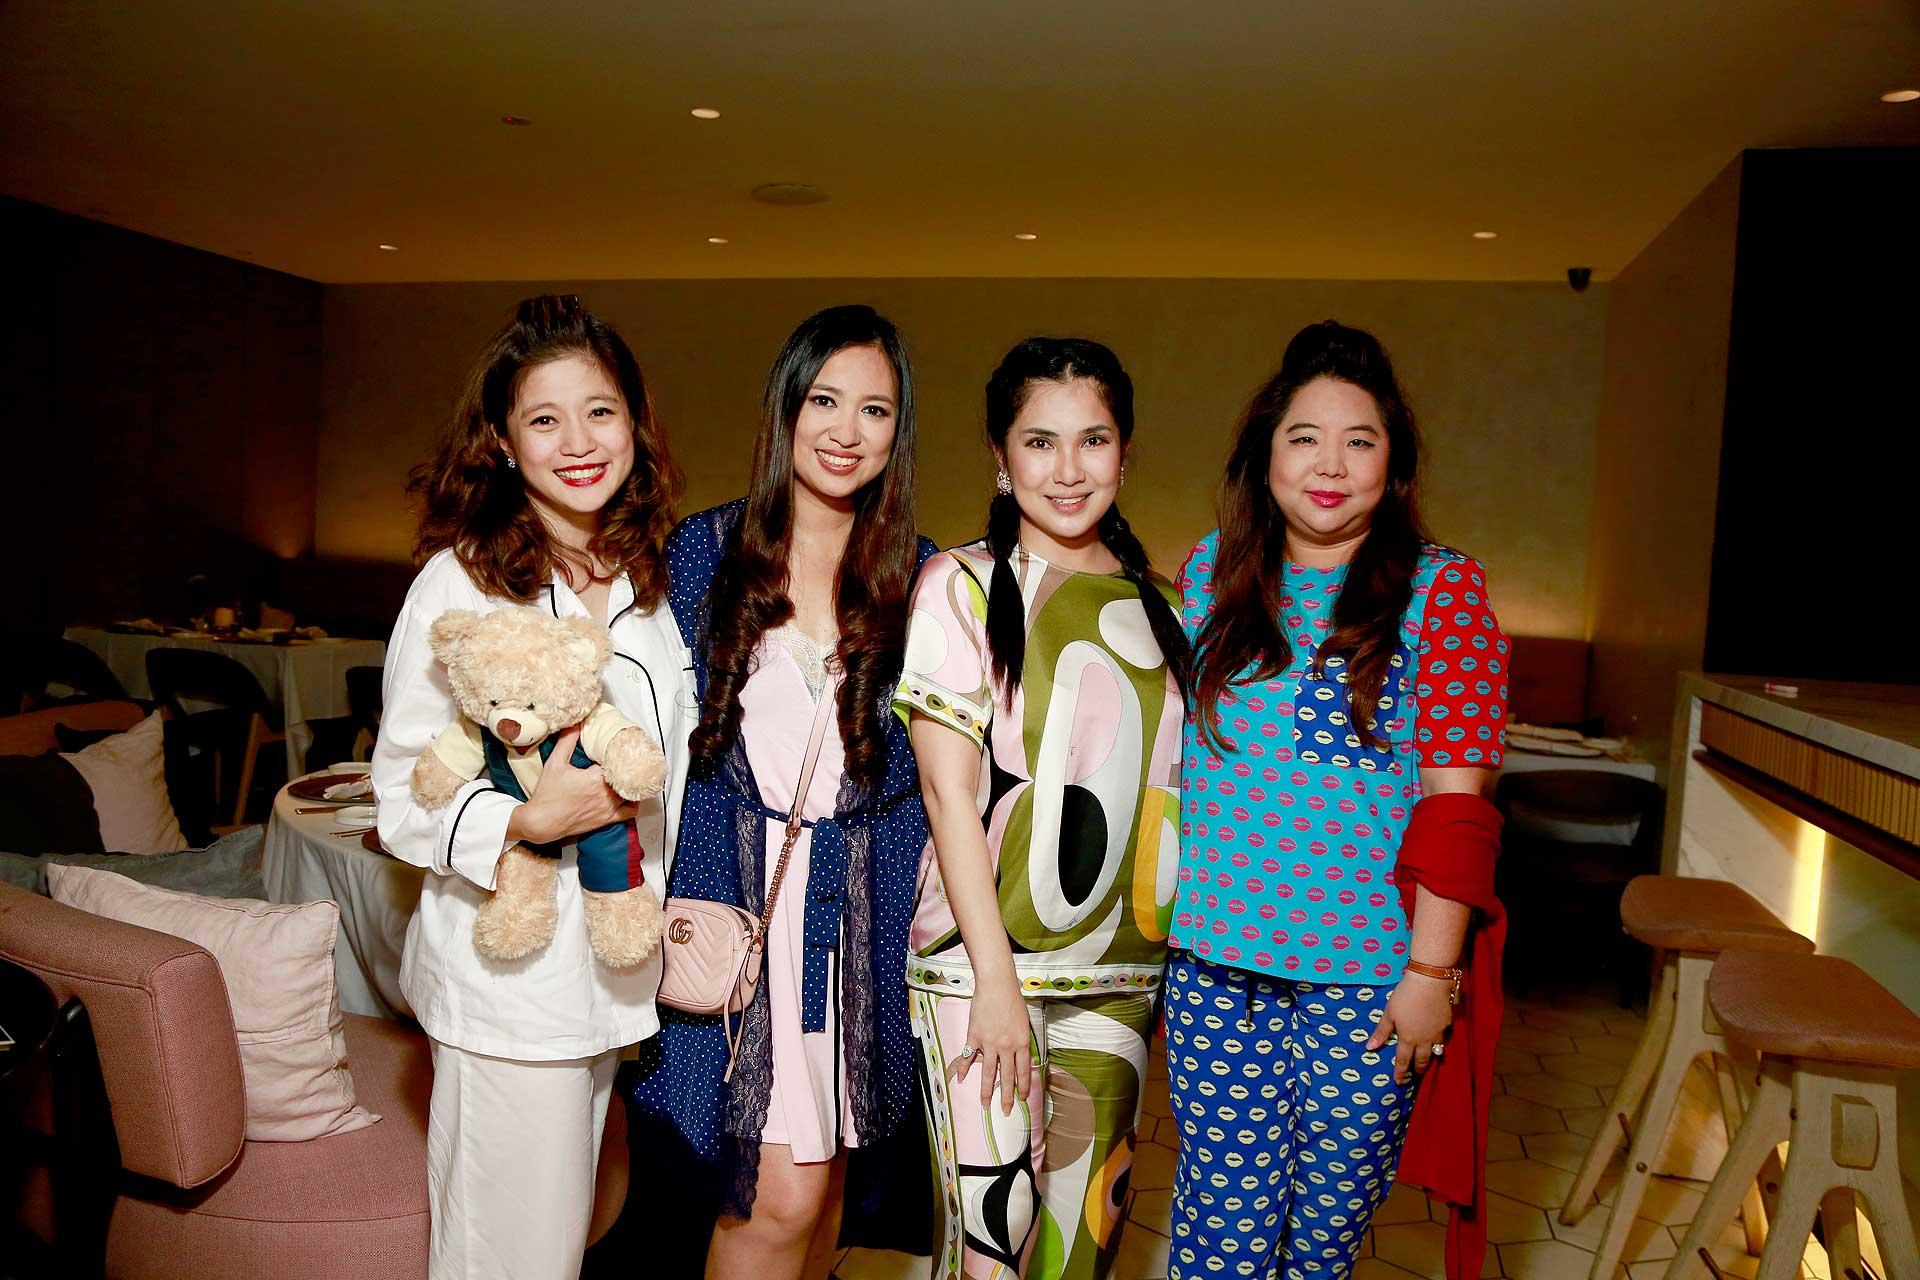 Mariam Teh, Datin Yvette Kang, Angela Karto and Yap Ai Leen